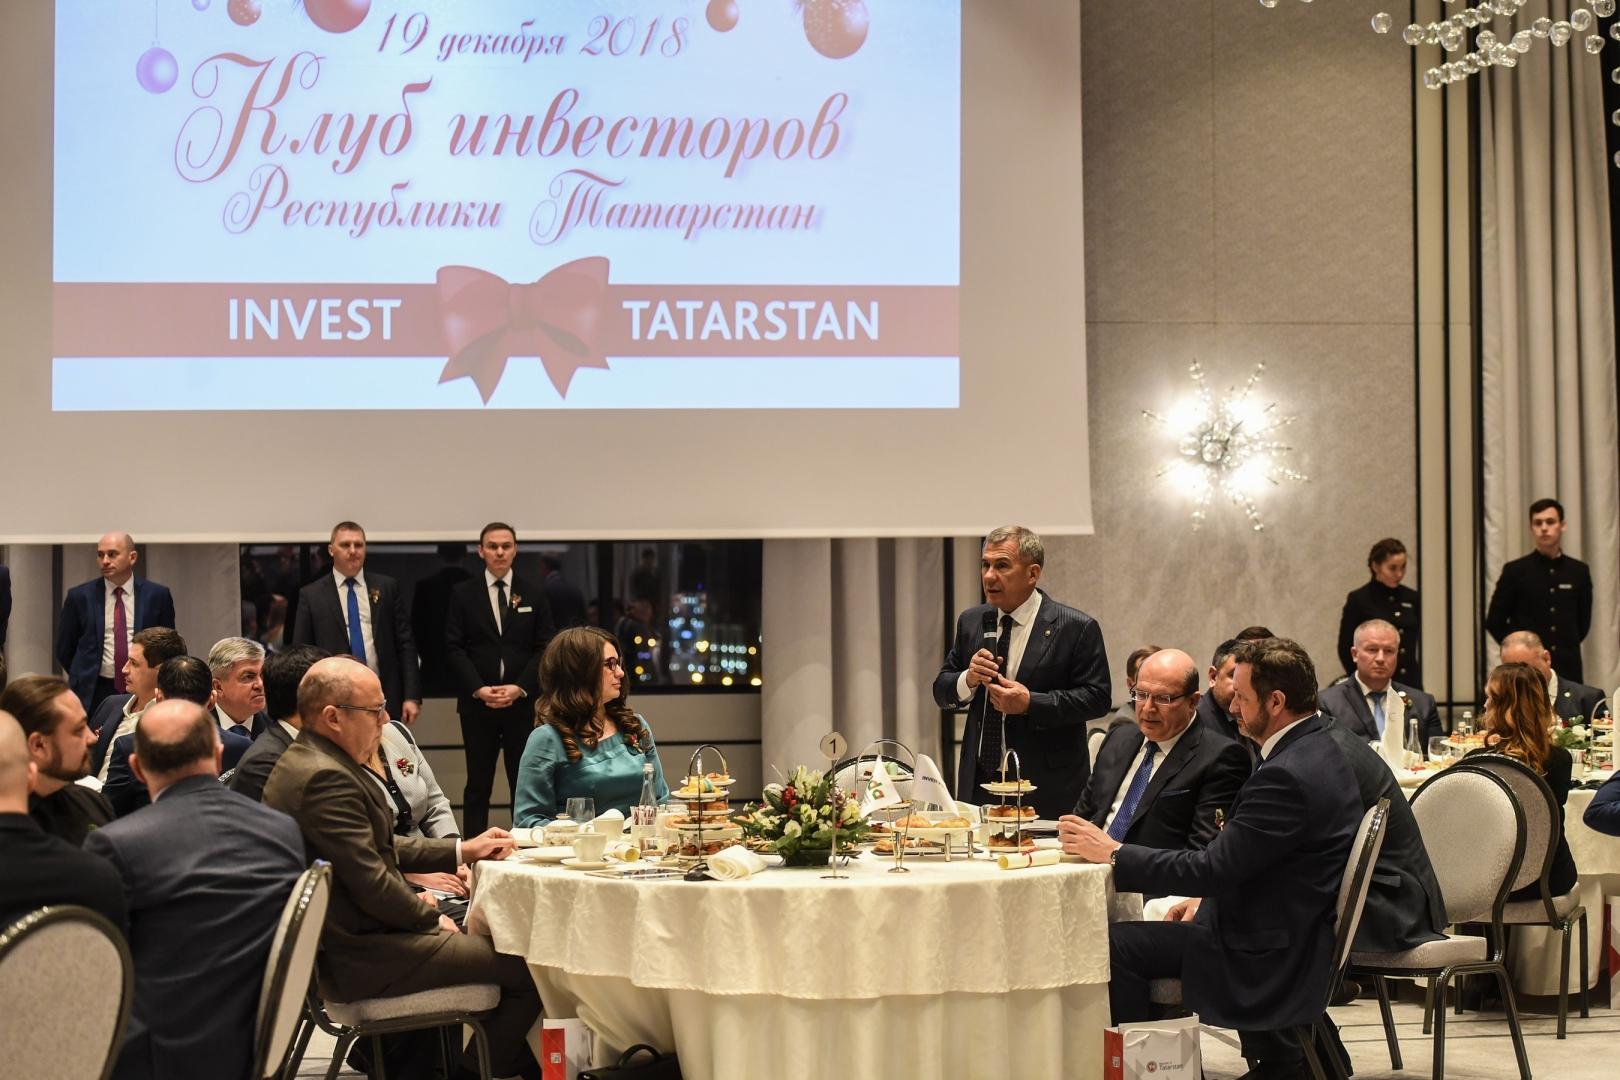 Заседание Клуба инвесторов Республики Татарстан